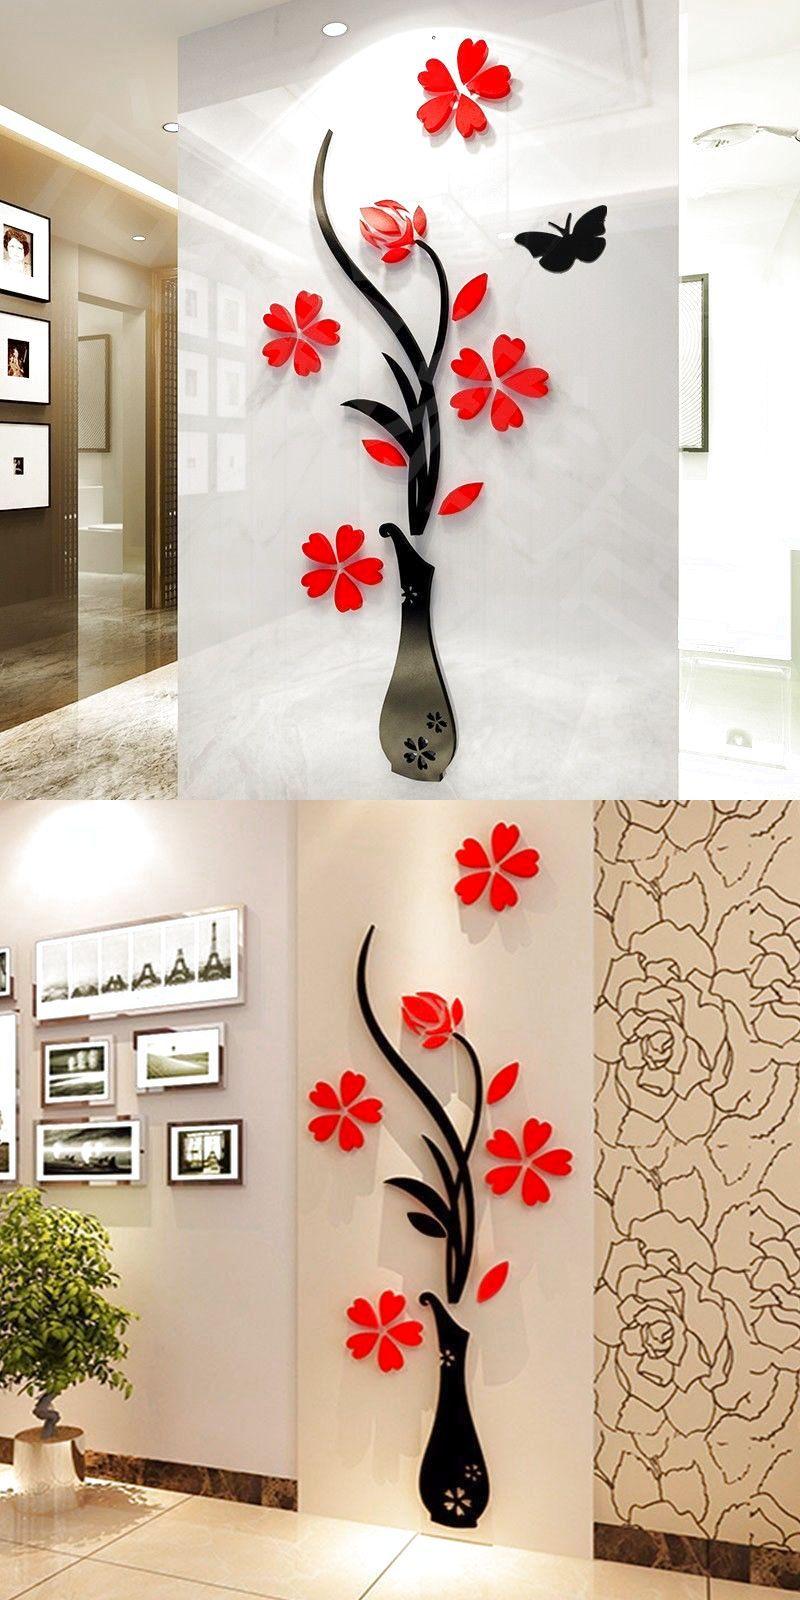 D flower diy beautiful mirror wall decals stickers art home room